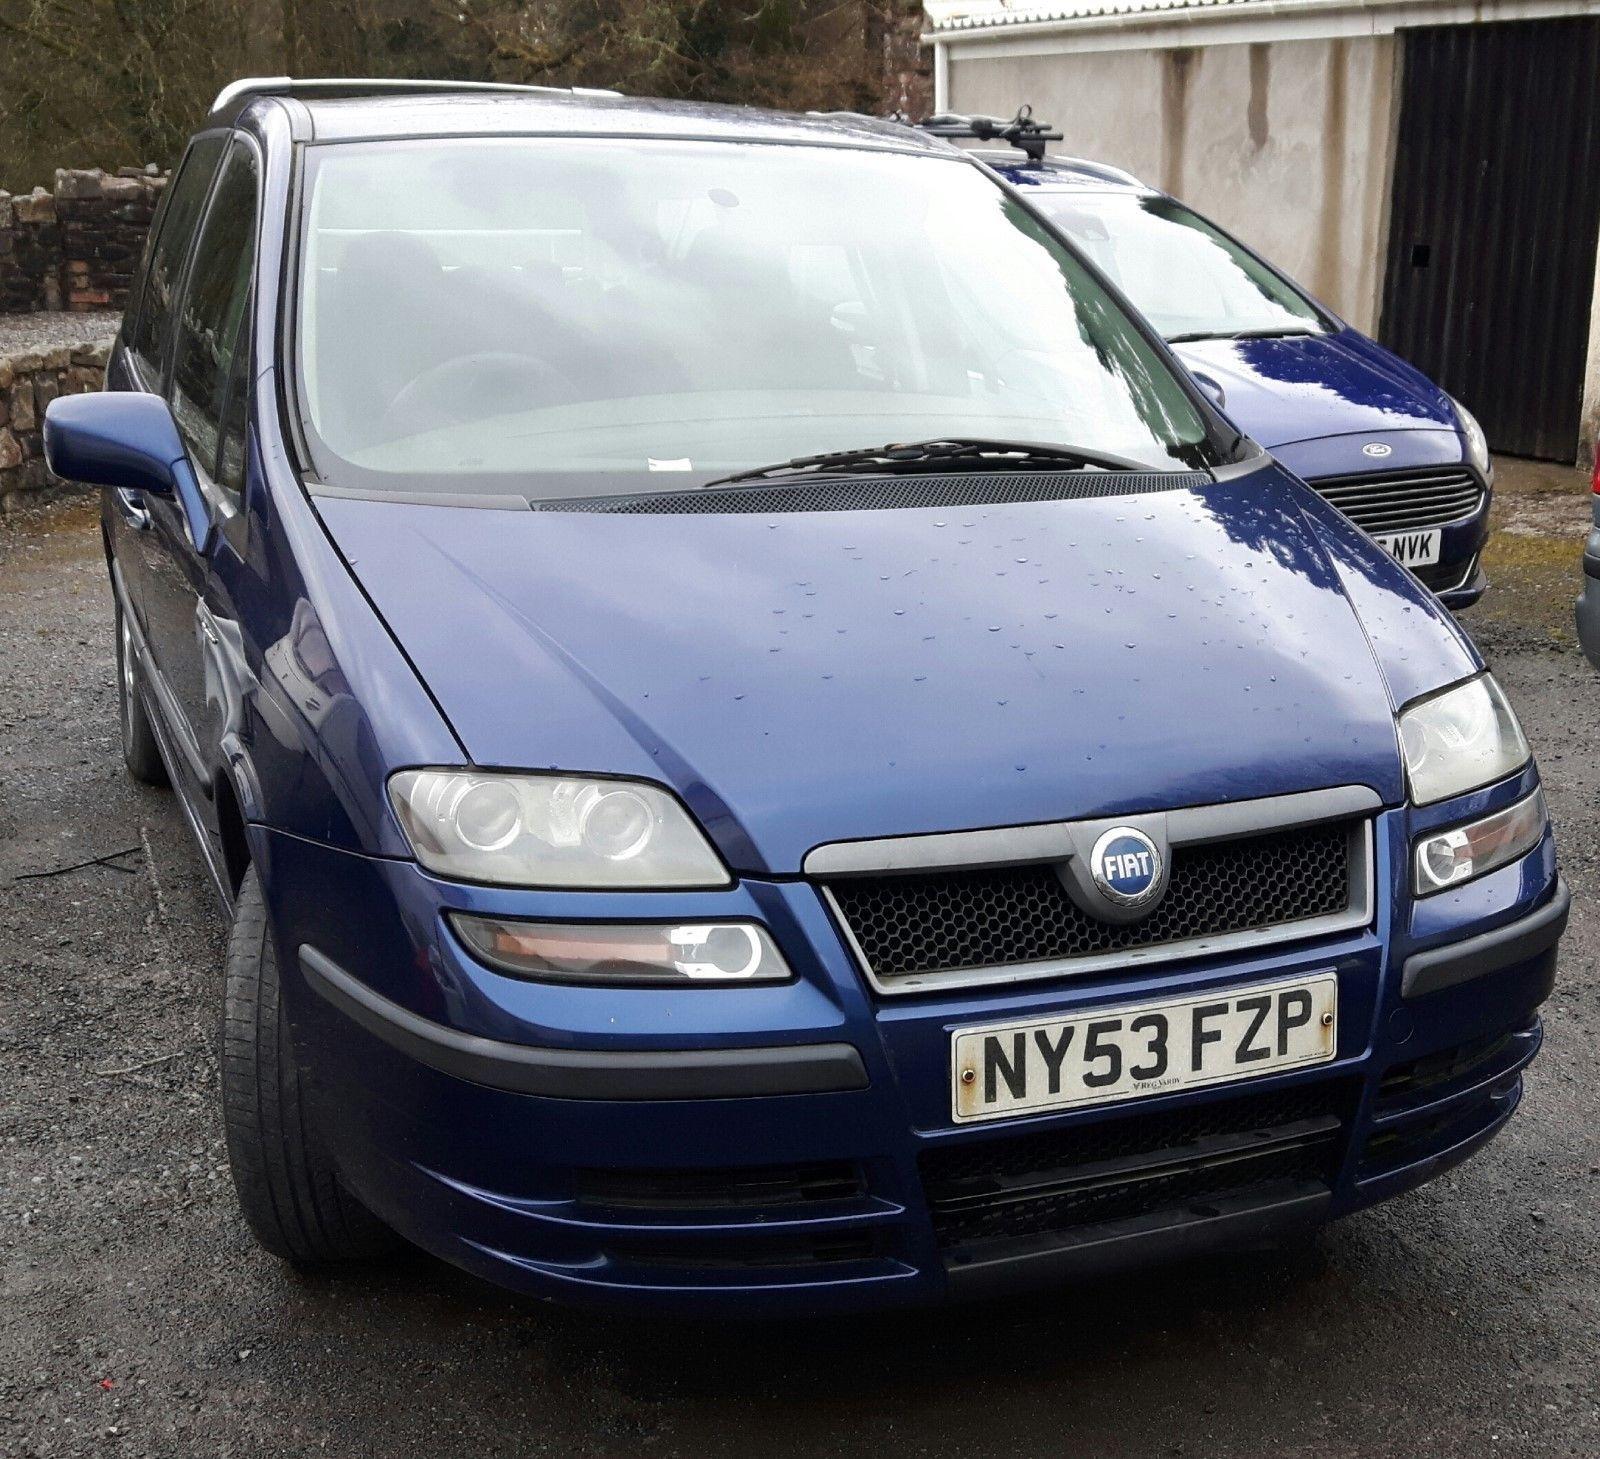 eBay: 2004 FIAT ULYSSE 2.0 Diesel 7 Seater - Selling for Spares or ...